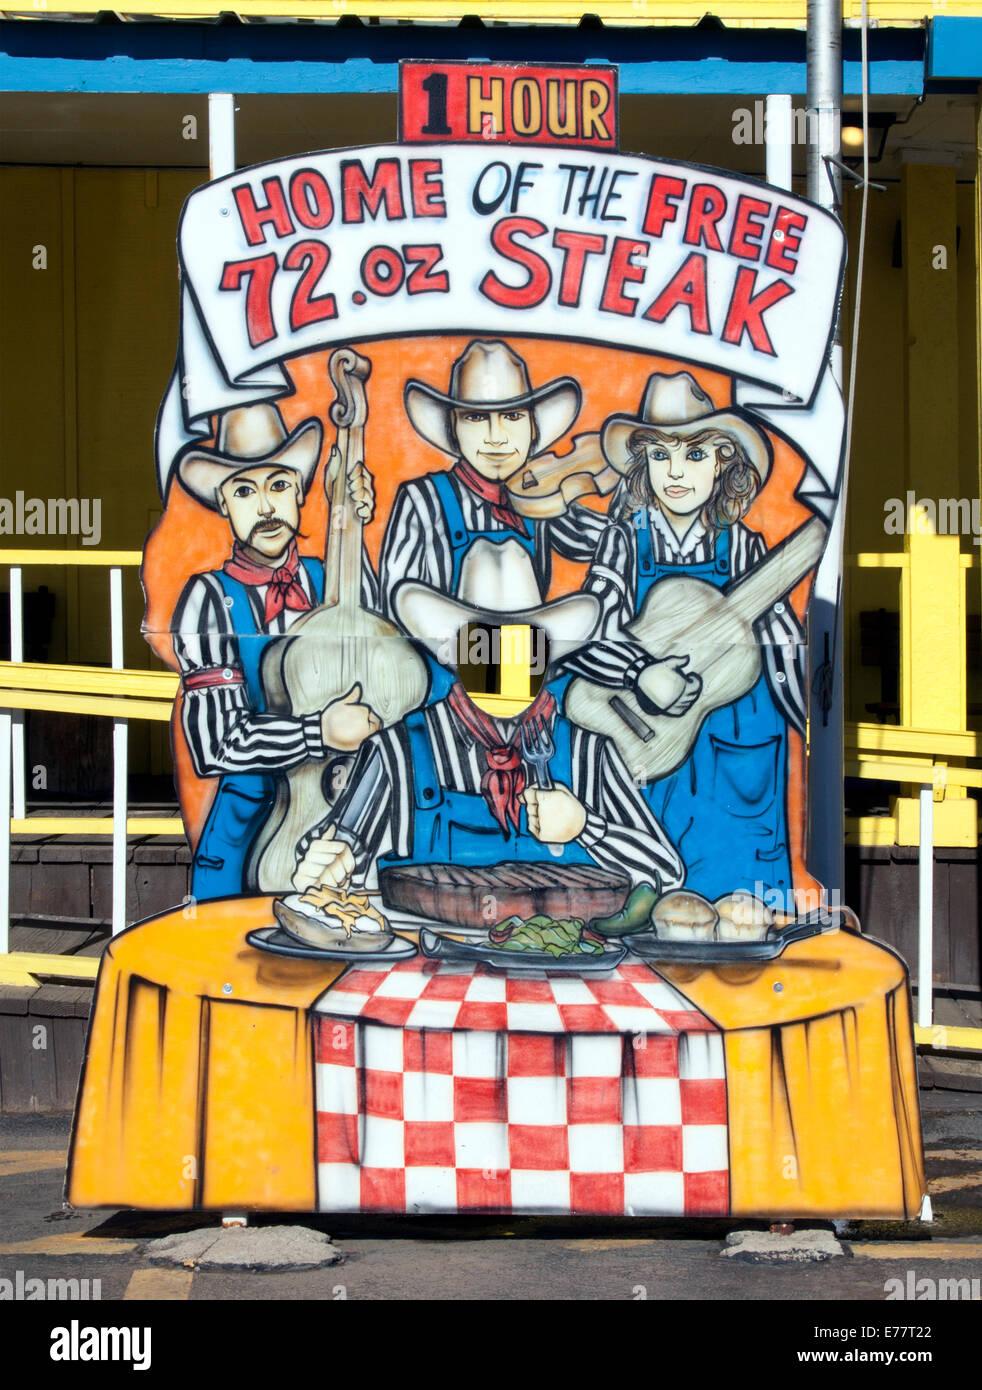 The Big Texan Steak Ranch restaurant in Amarillo - Stock Image